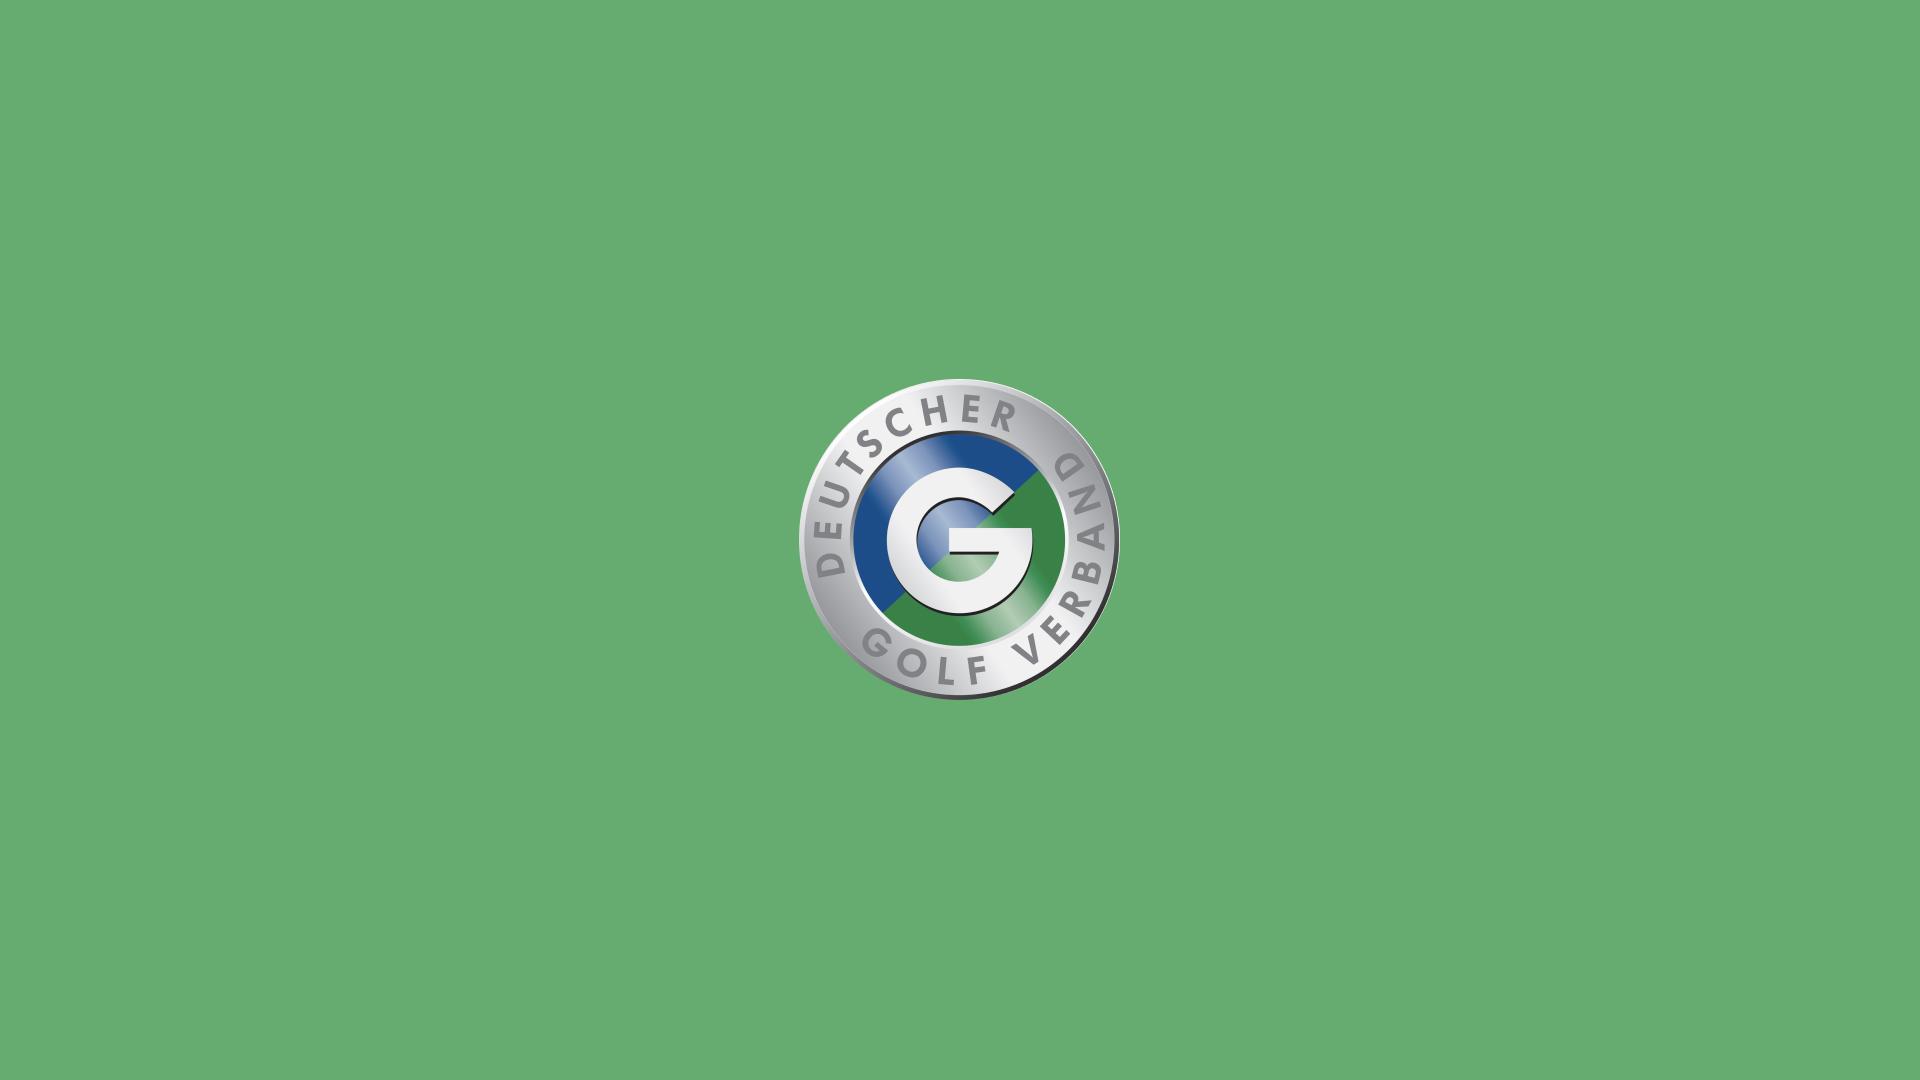 DGV Golfausweis